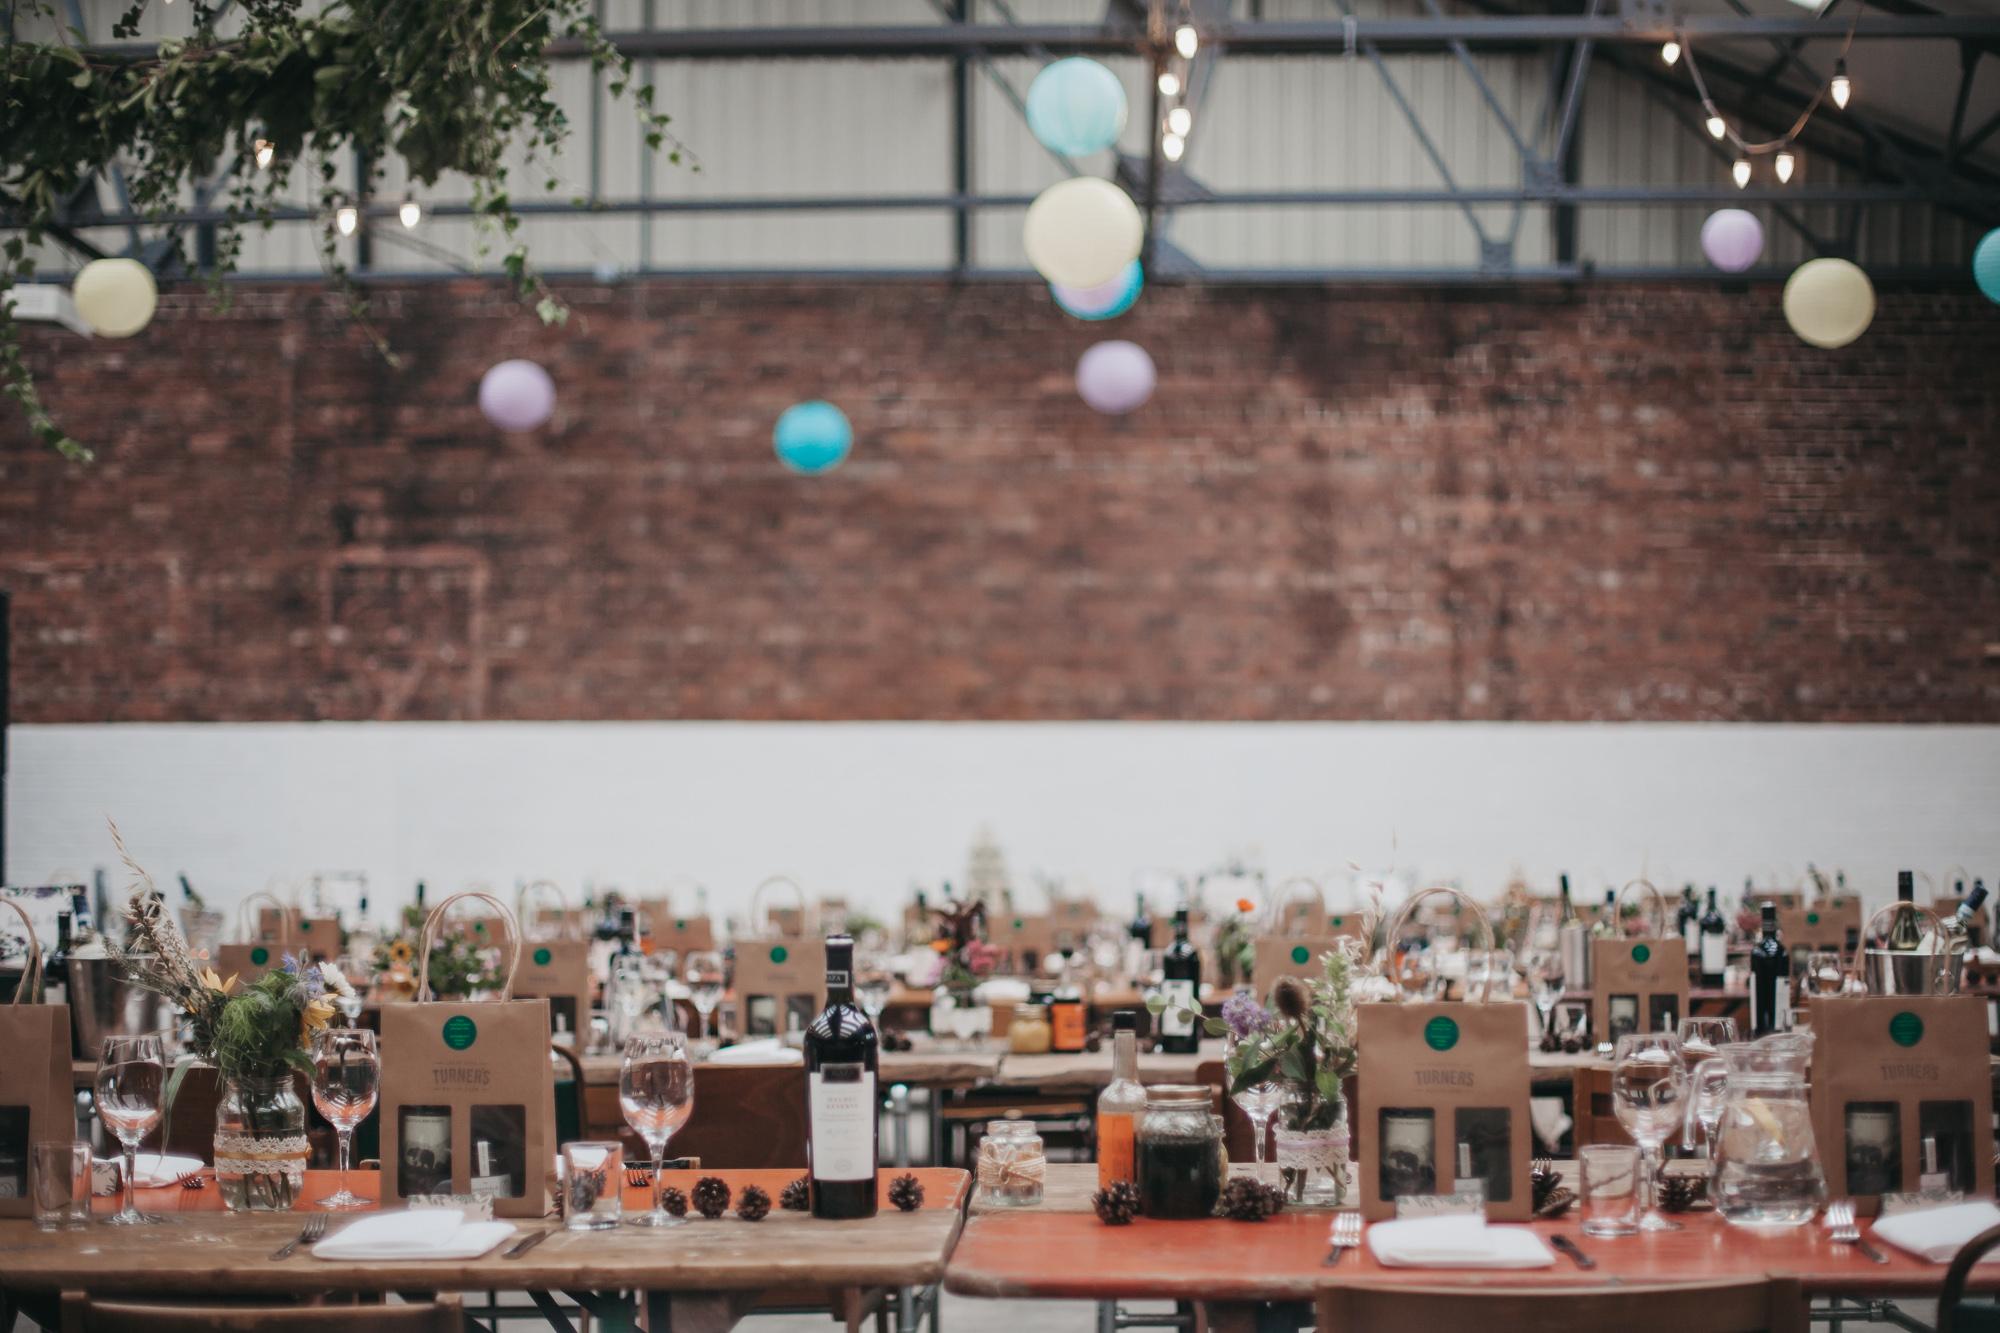 Kristy-Back-Garden-Outdoor-Wedding-Sheffield-Industrial-Warehouse-Wedding-Bohemian-Kate-Beaumont-Dahlia-Dress-40.jpg